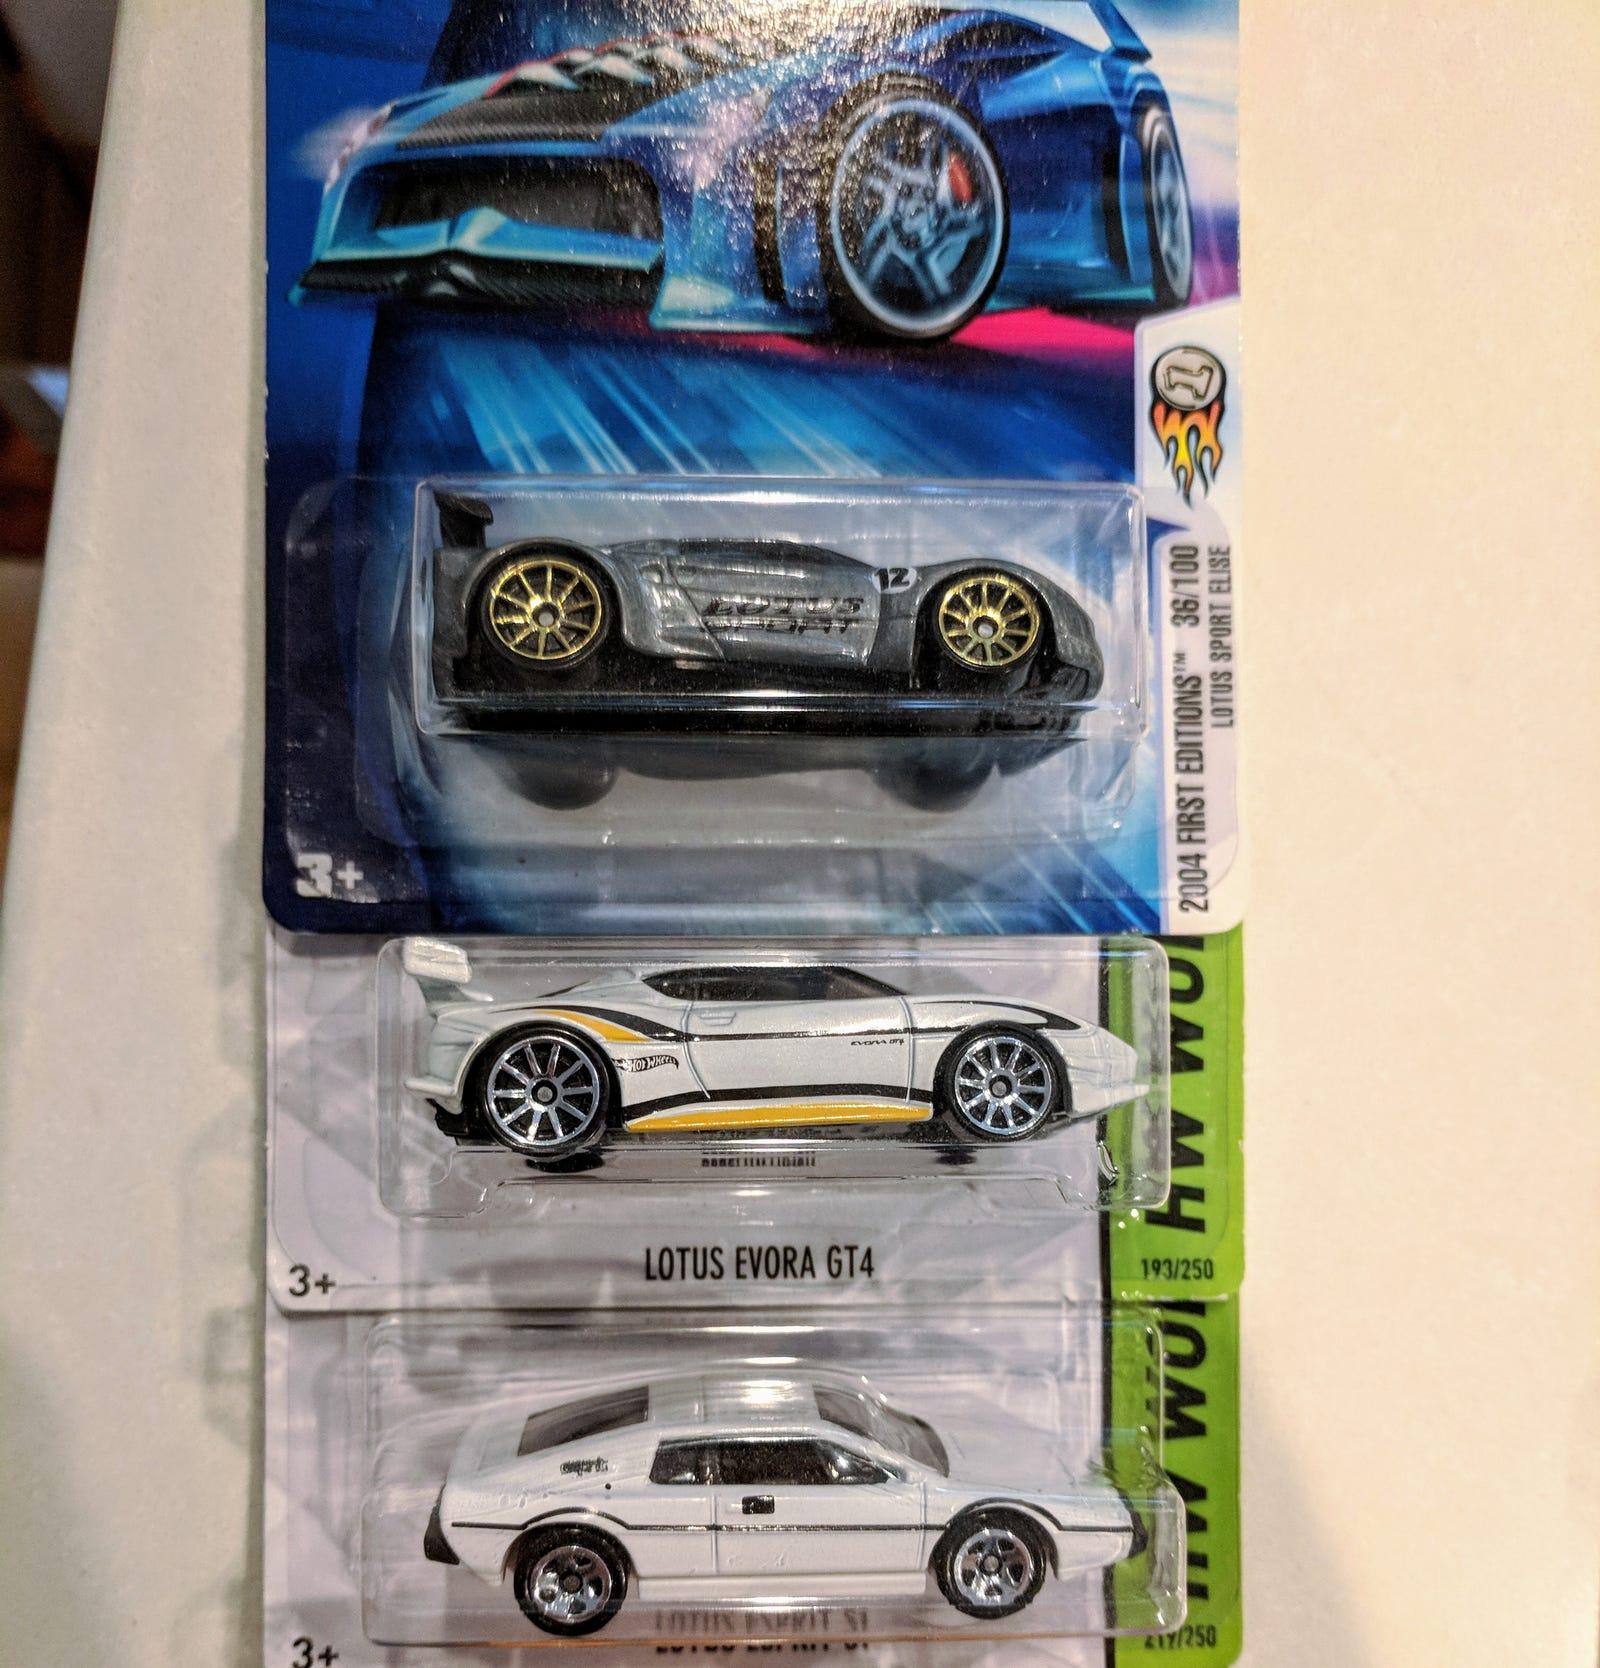 Lotus Elise, Evora GT4, and S1 Esprit